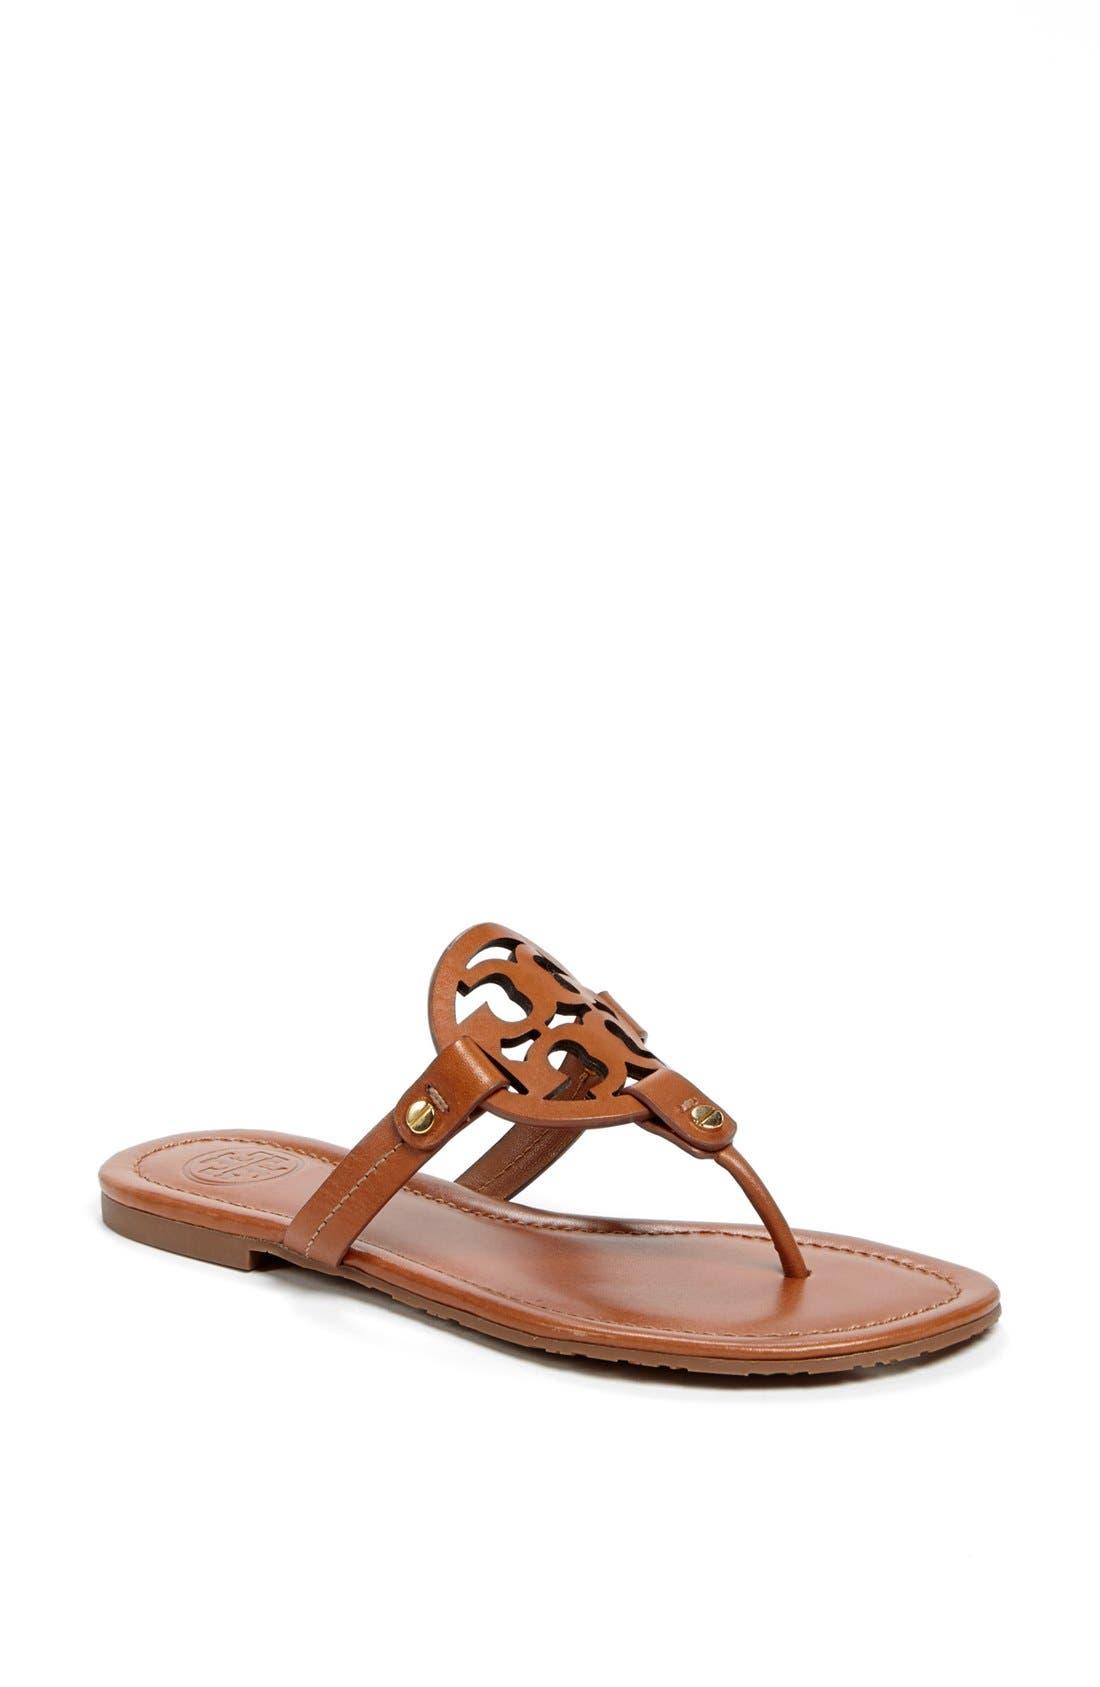 Tory Burch 'Miller' Thong Sandal